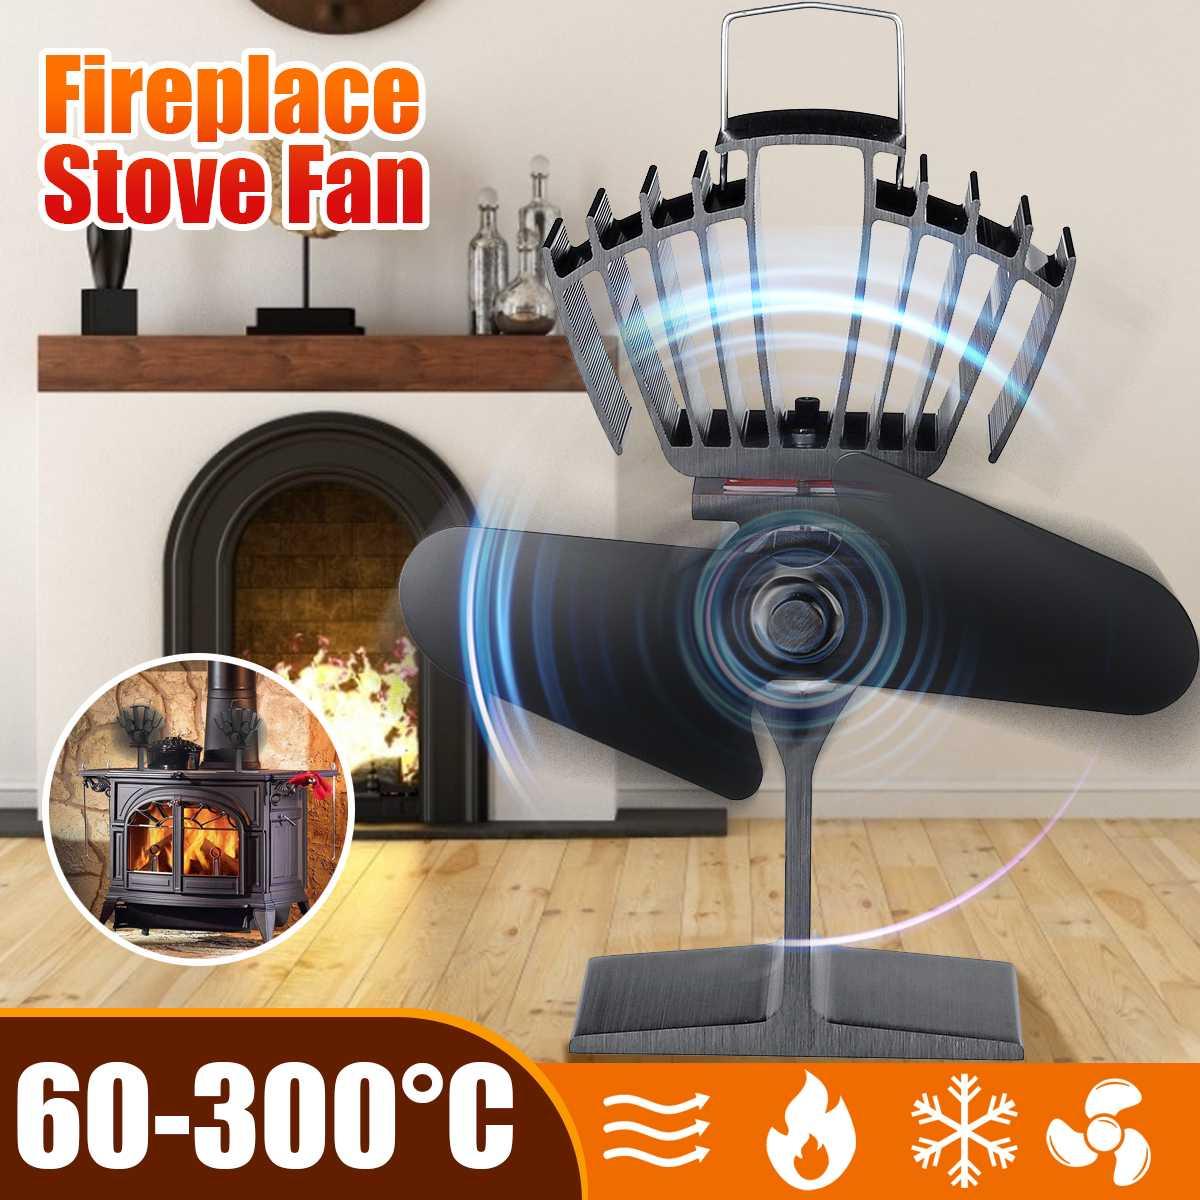 Home Heat Powered Stove Fan 2 Blades 150CFM Log Wood Burner Eco Fan Quiet Black Fireplace Fan Efficient Heat Distribution